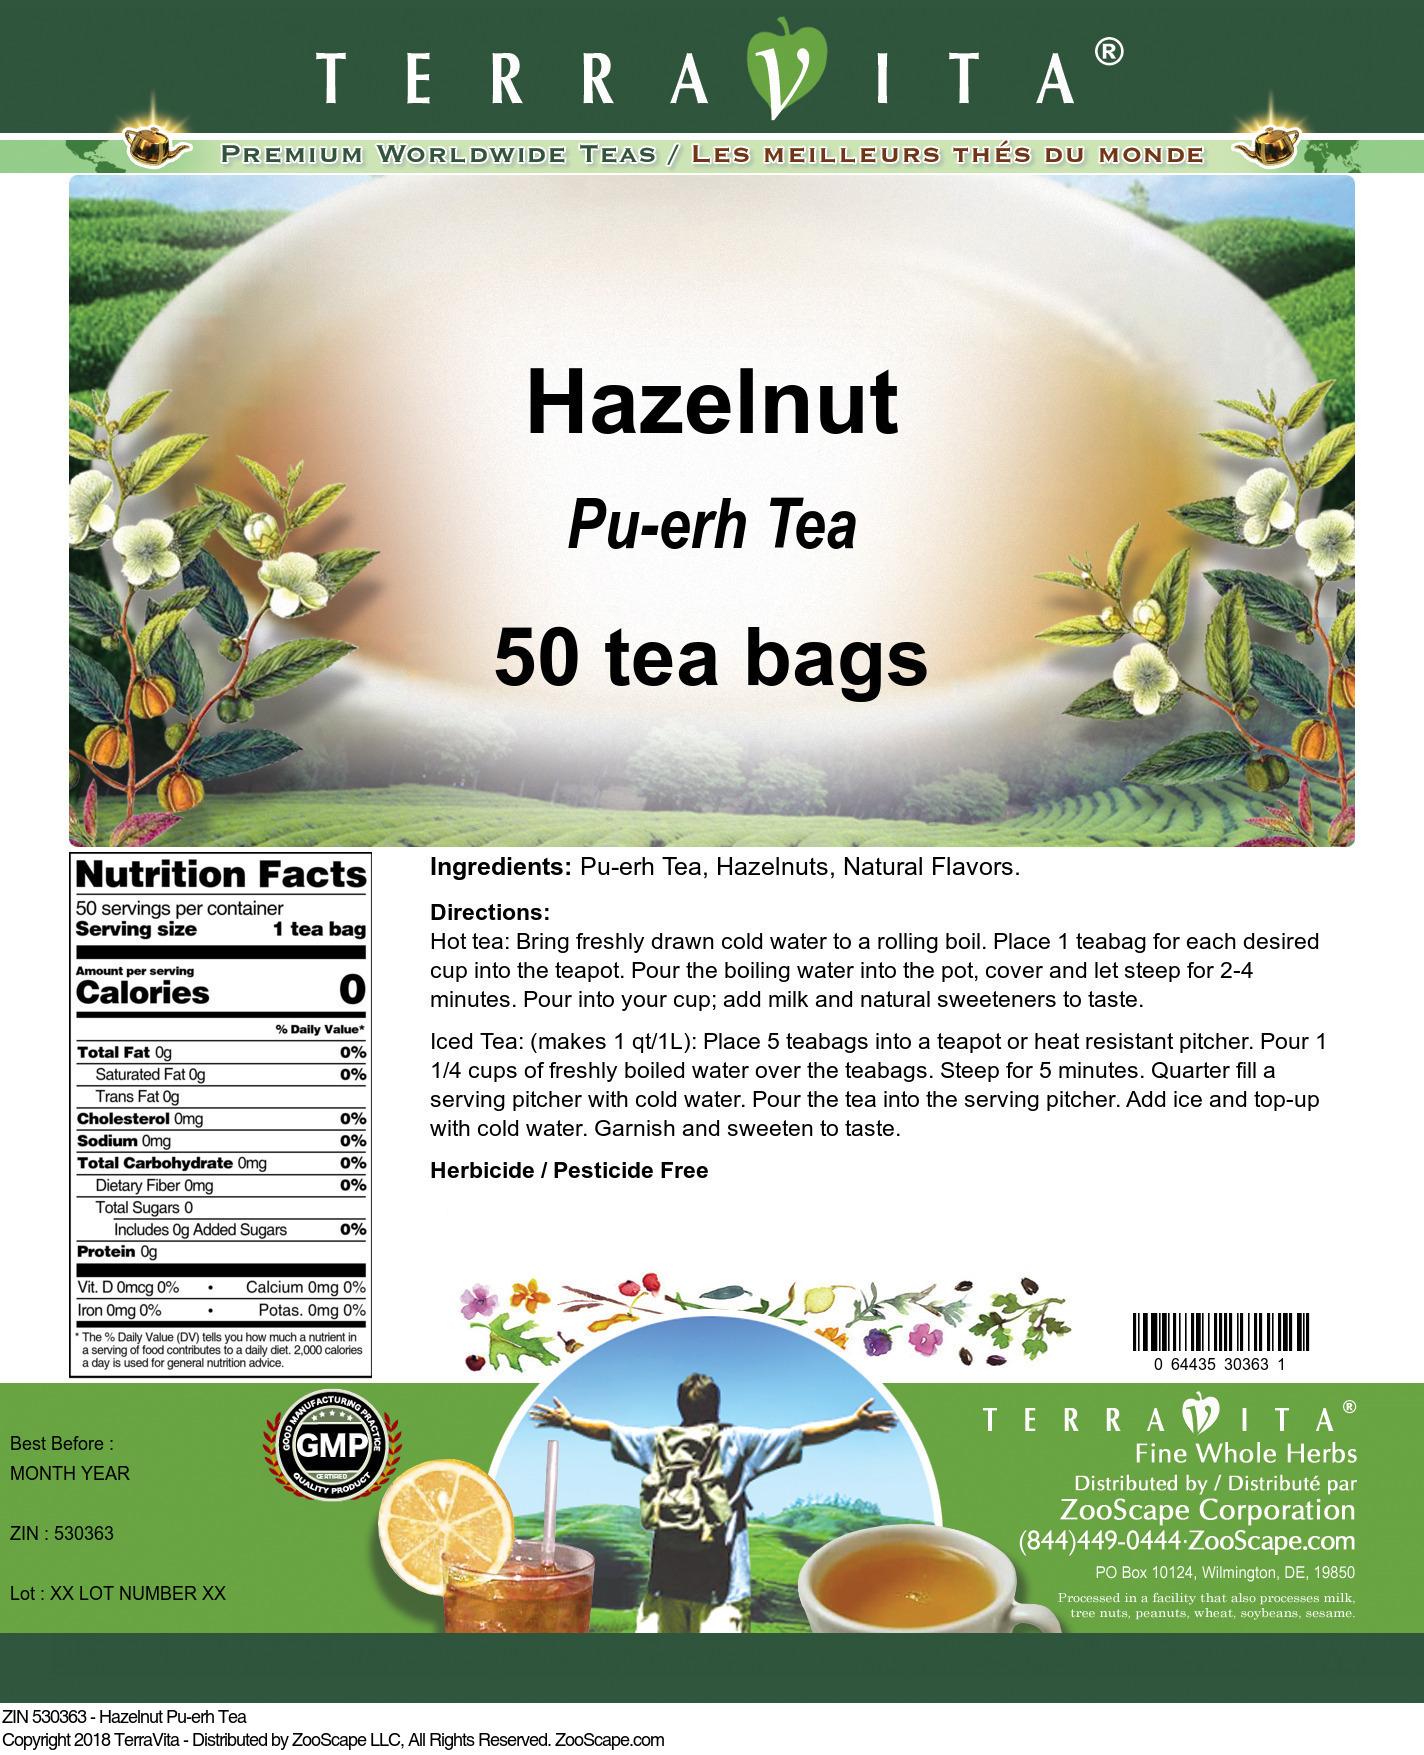 Hazelnut Pu-erh Tea